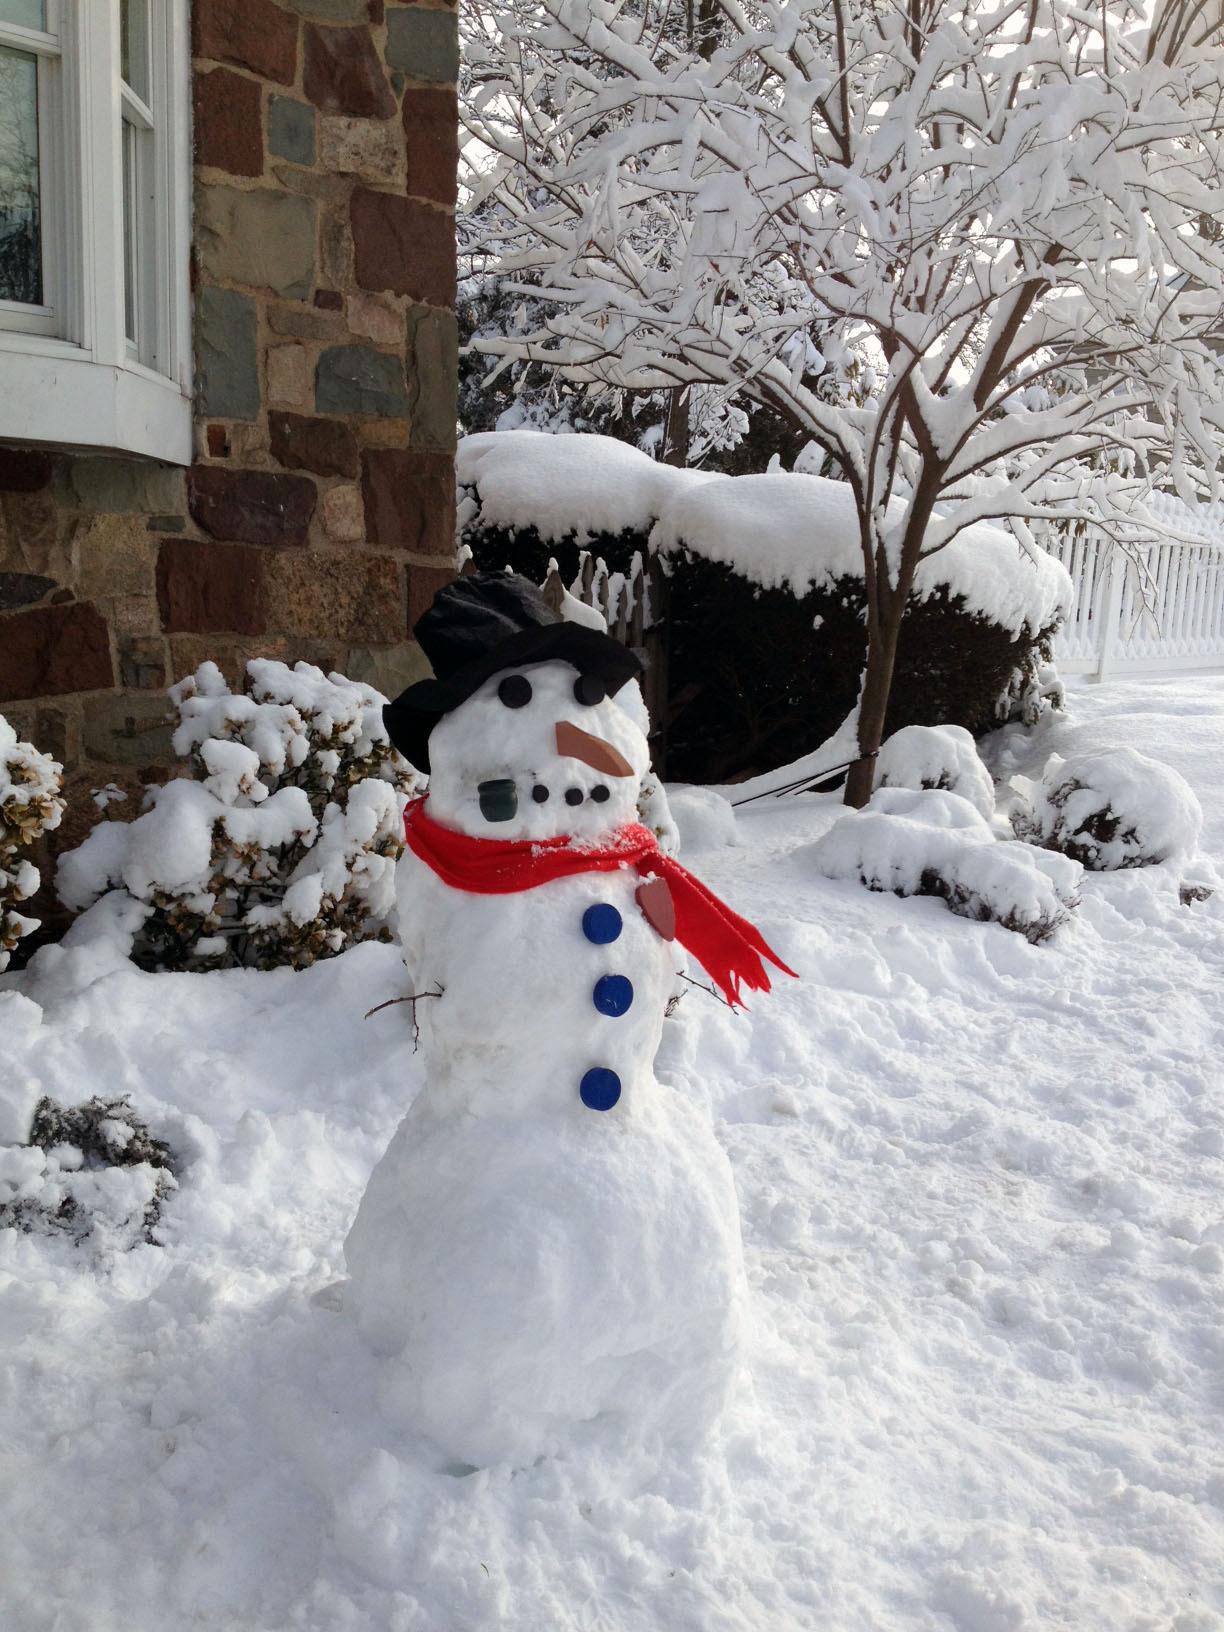 022579aff605296a3e1b_Snowman.jpg